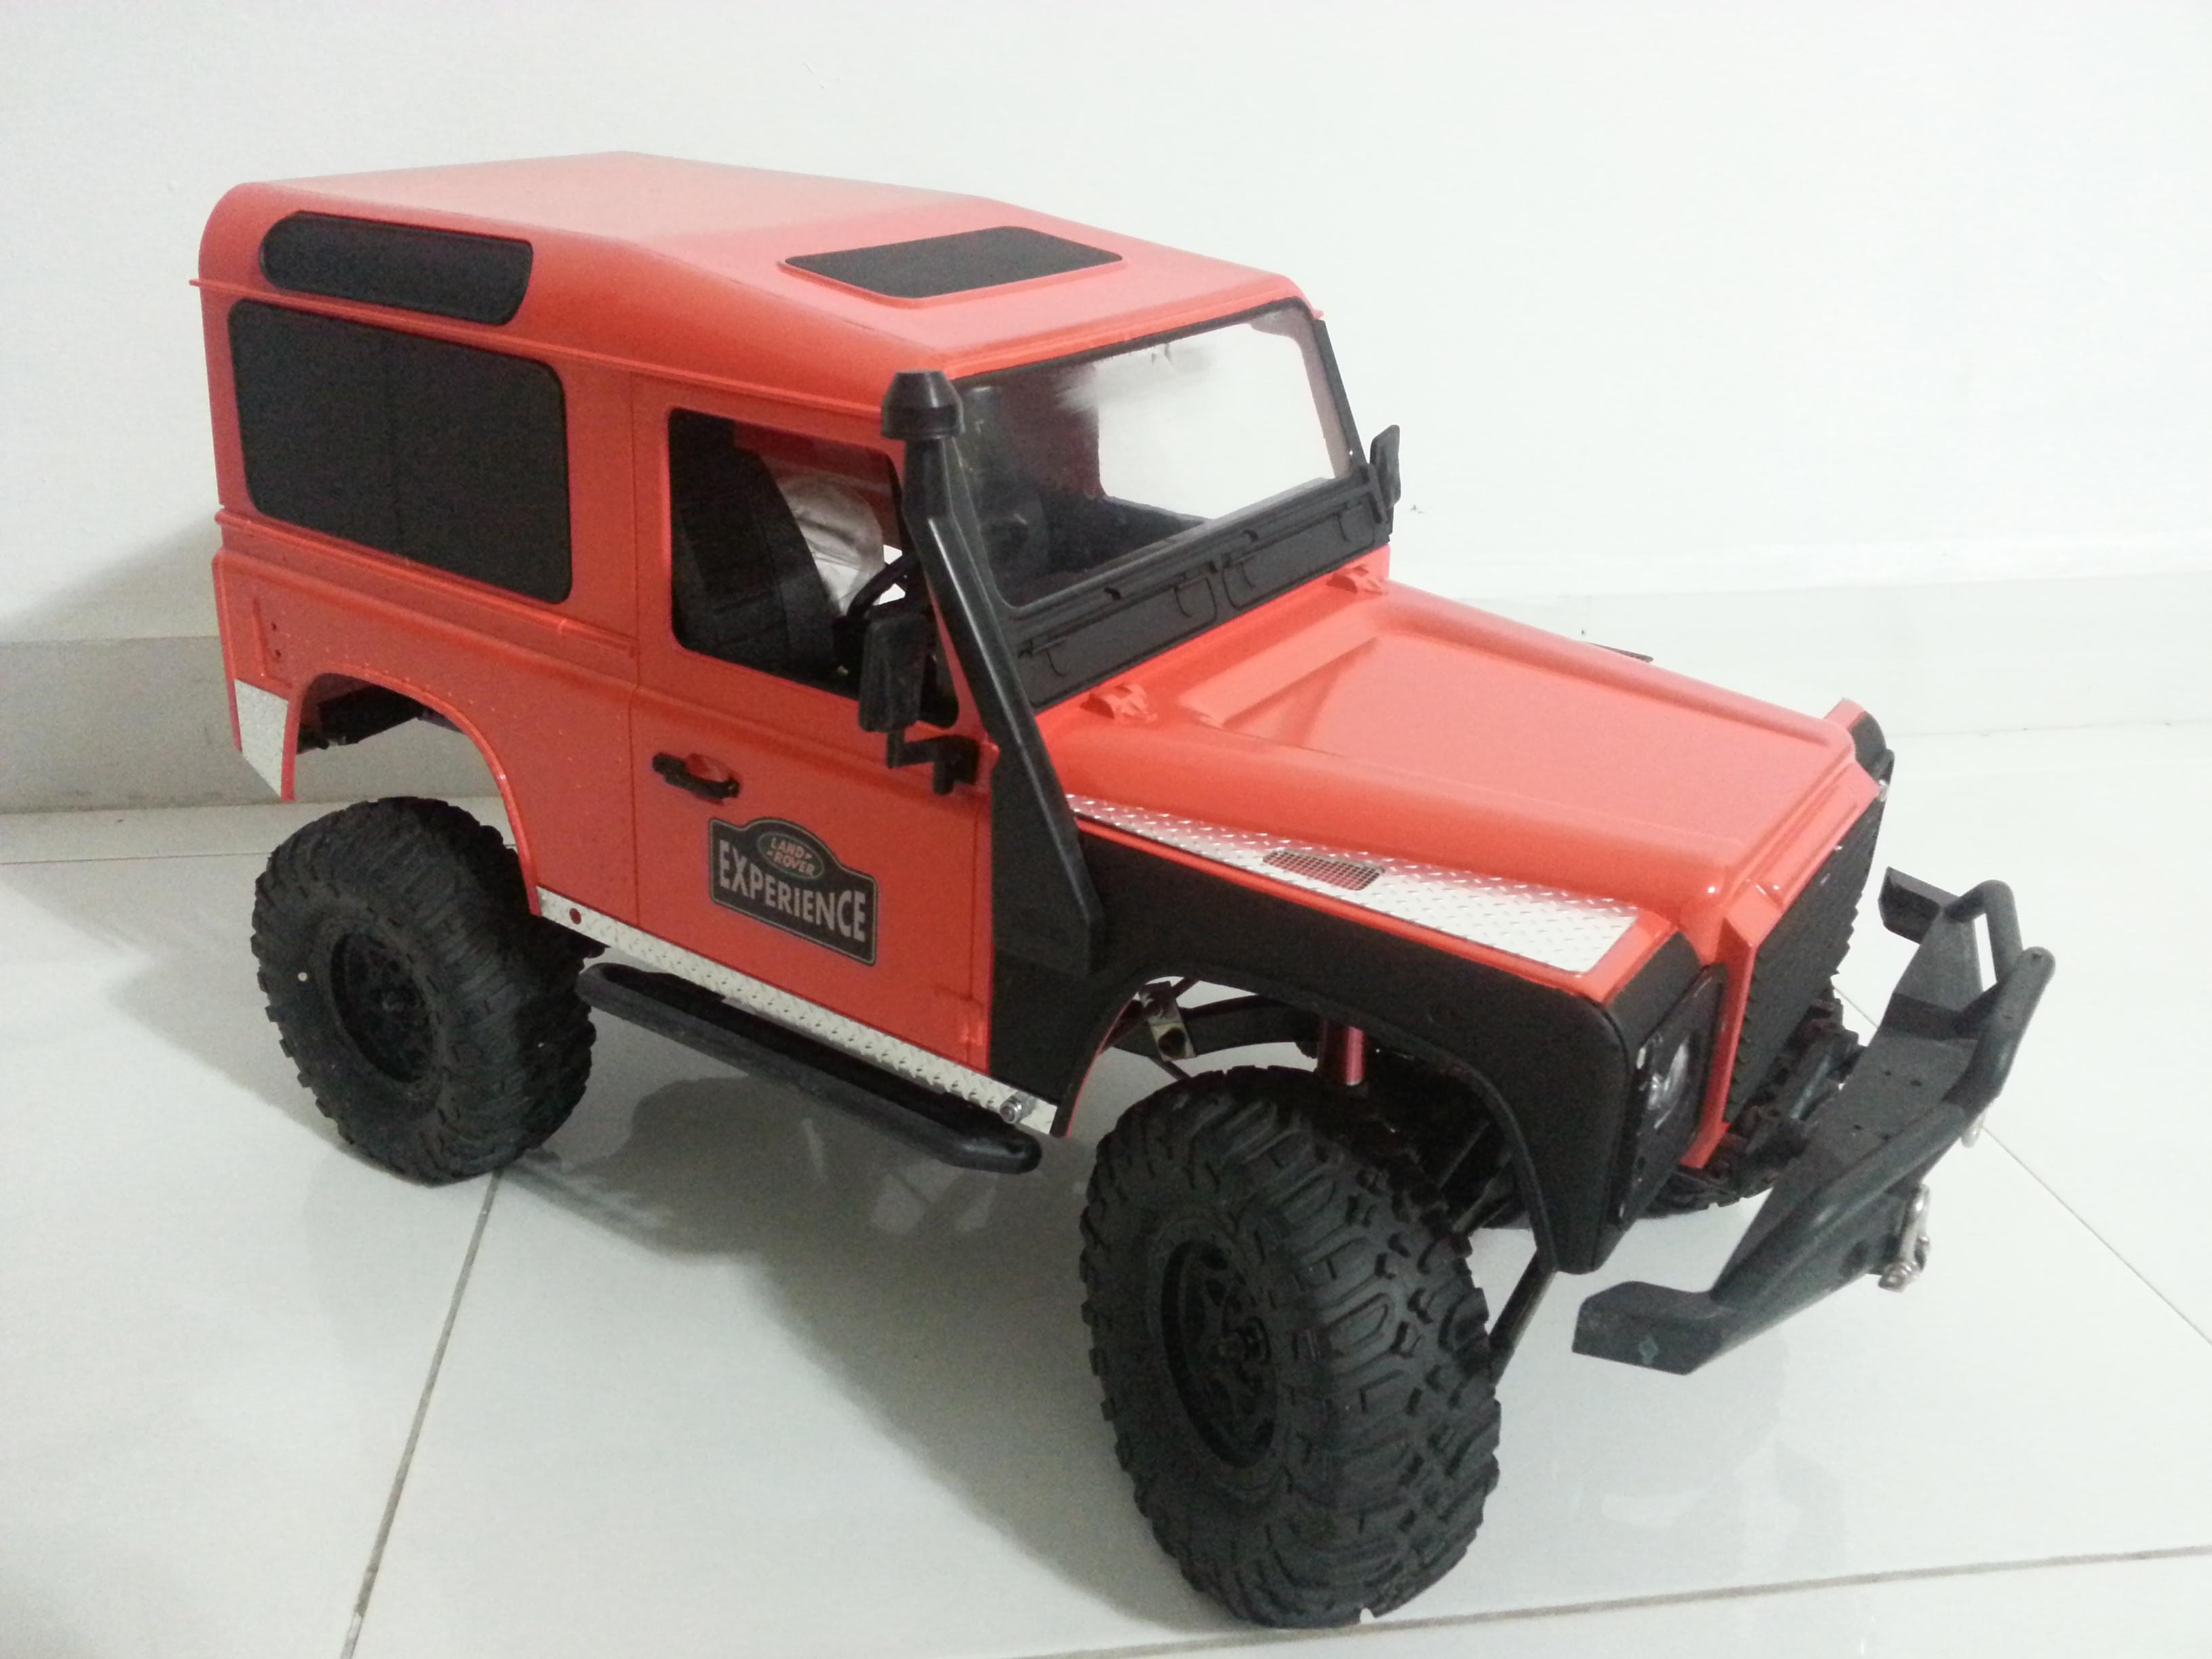 rover - Babyboy's 2nd Land Rover Defender D90 14981725955_f55d8ffa4c_o